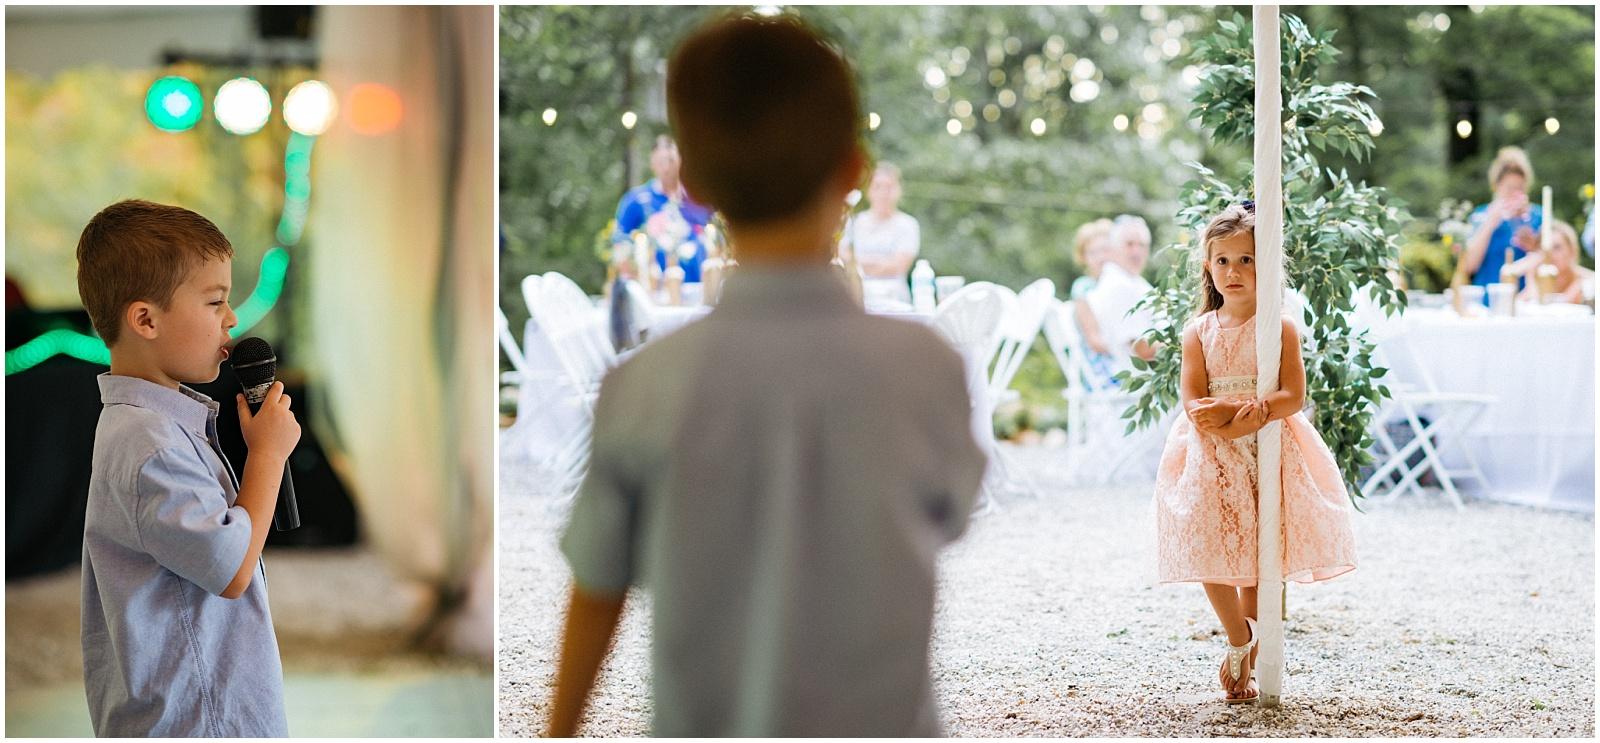 Ryan_Rechelle_Nantahalla_Weddings_Andrews_NC-181_Ryan_Rechelle_McGuire's_Millrace_Andrews_NC.jpg